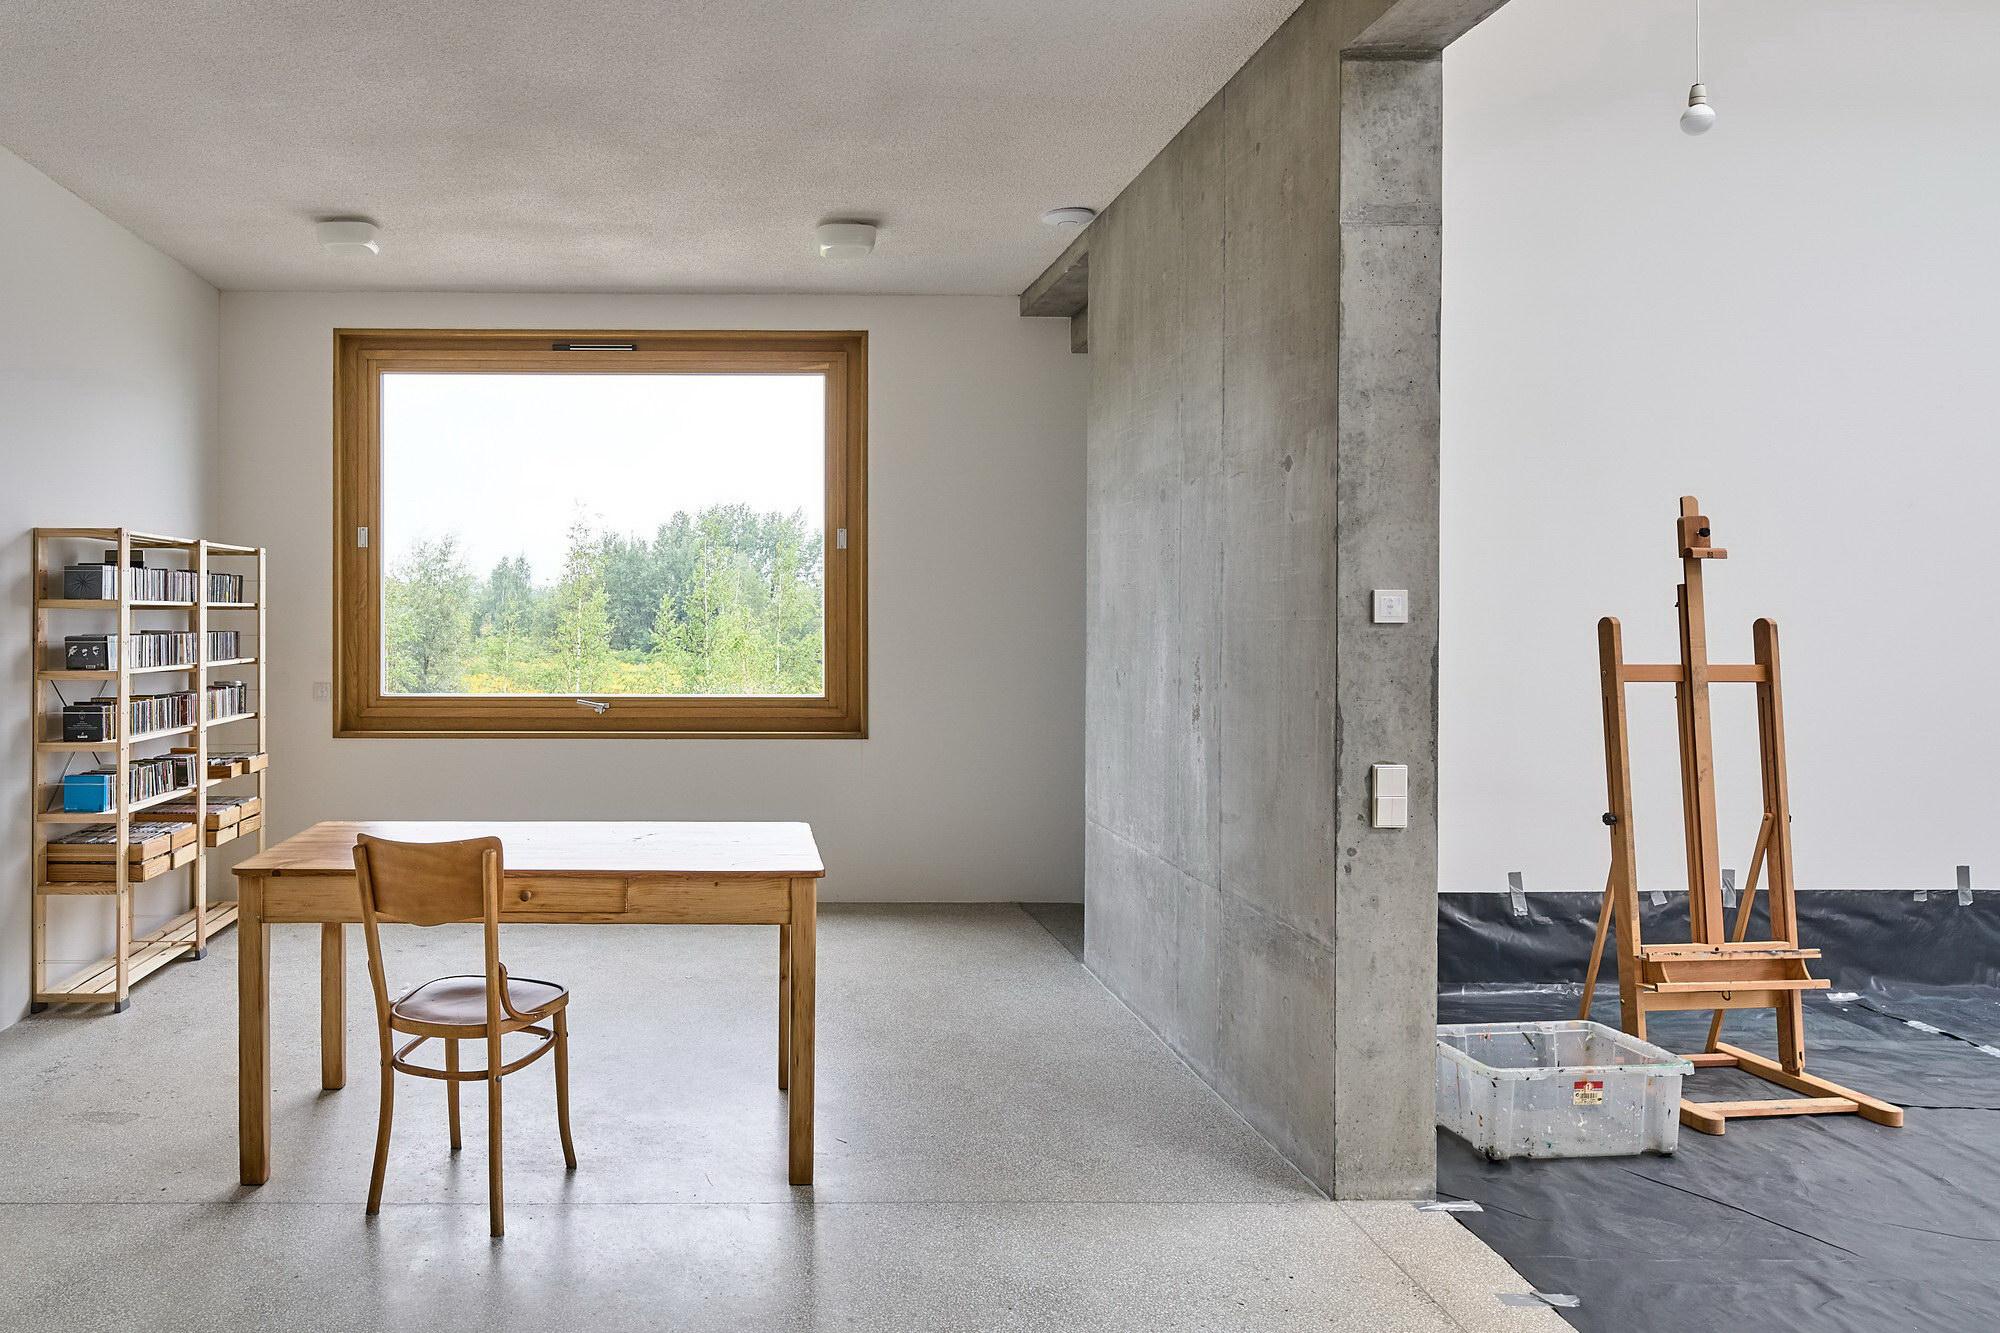 Artists' Home and Studio by Piotr Brzoza Architekten